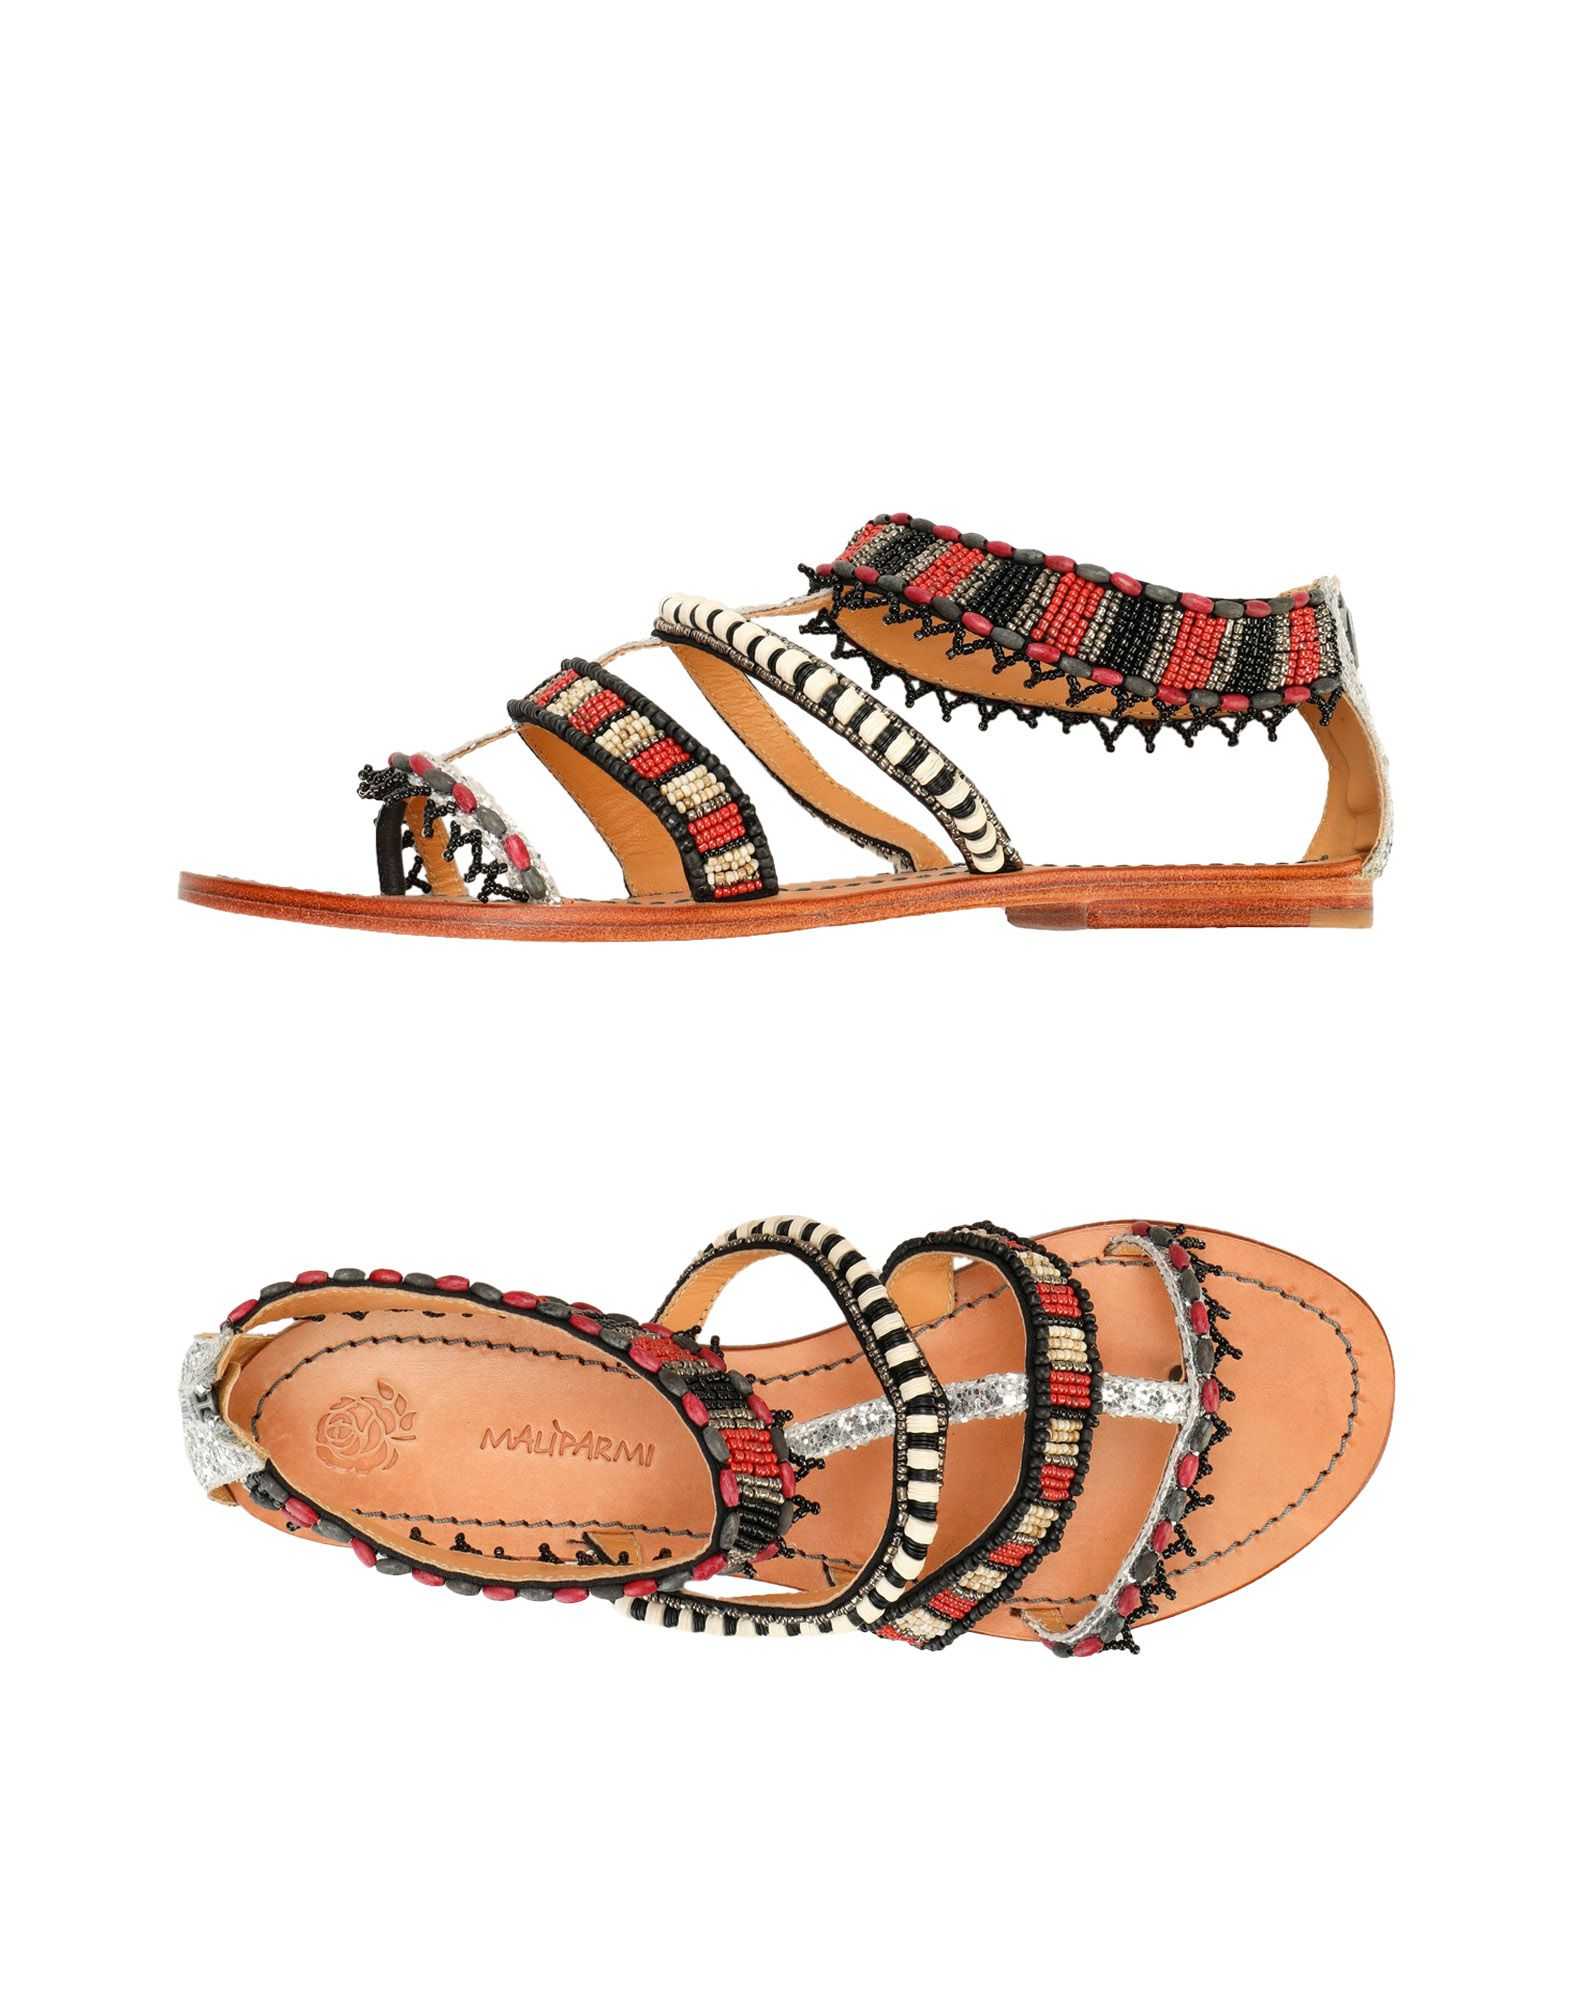 Stilvolle billige Schuhe Damen Malìparmi Dianetten Damen Schuhe  11372279SN d035e8